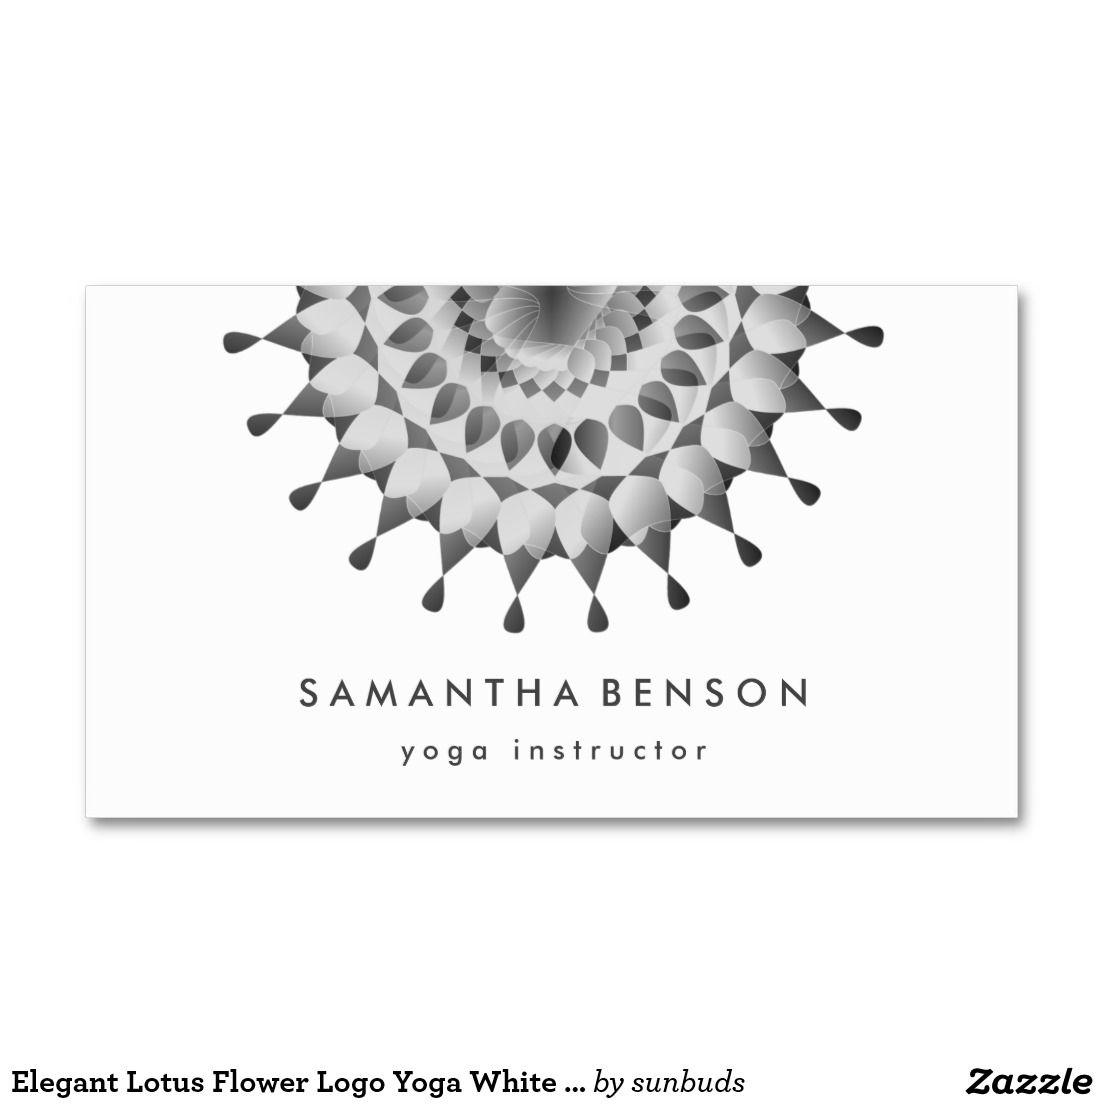 Elegant Lotus Flower Logo Yoga White Background Business Card ...